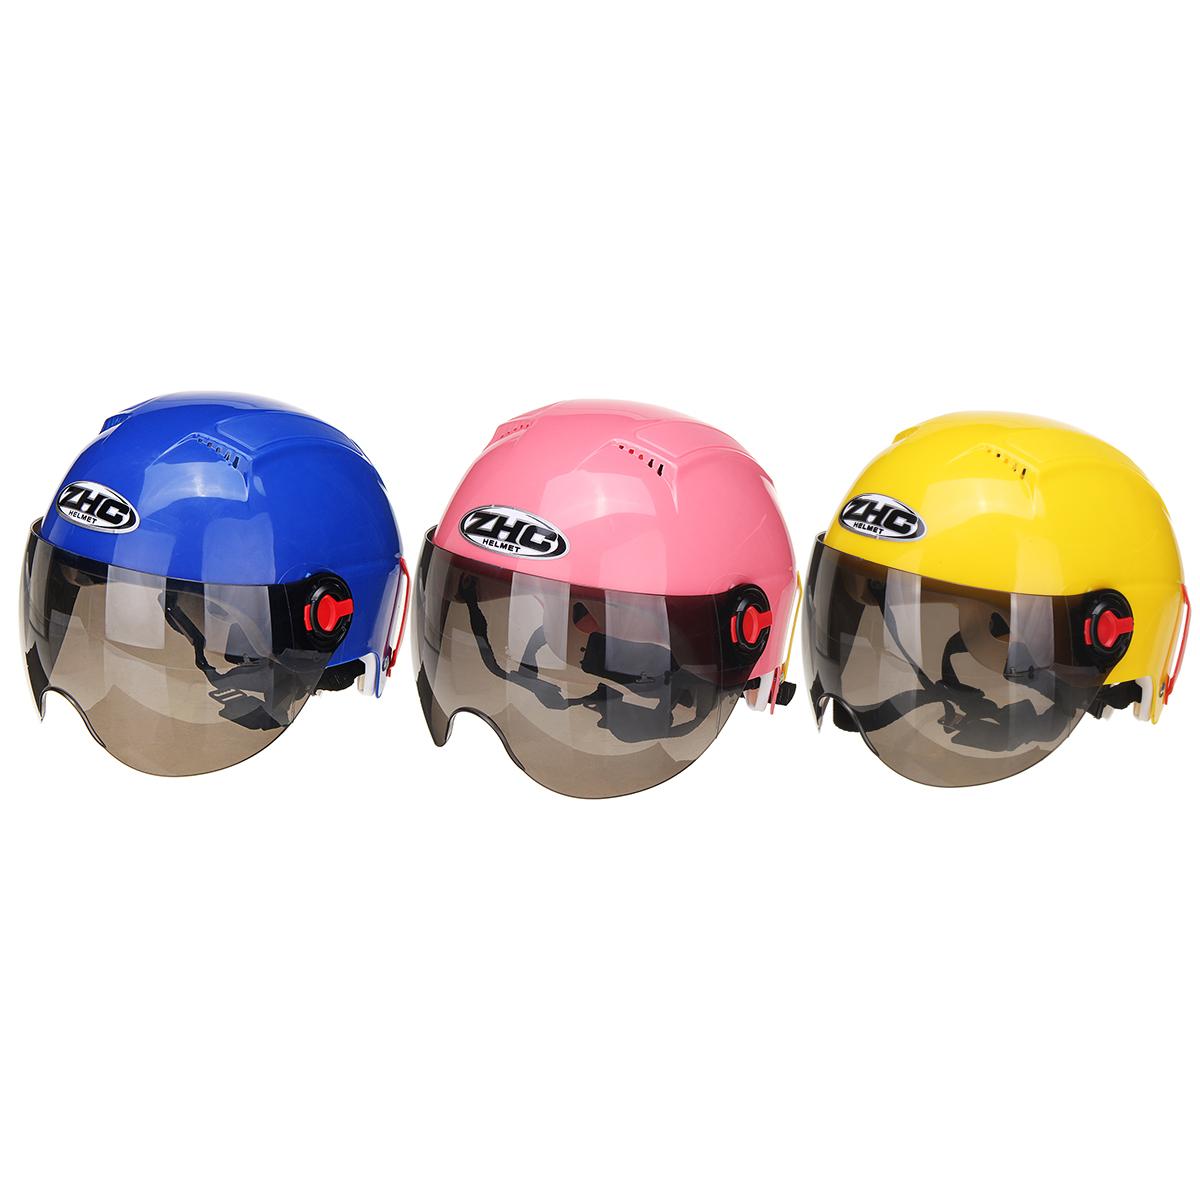 Motorcycle Half Helmet Open Face Cycling Outdoor Sports Flip Up Sun Visor Helmets